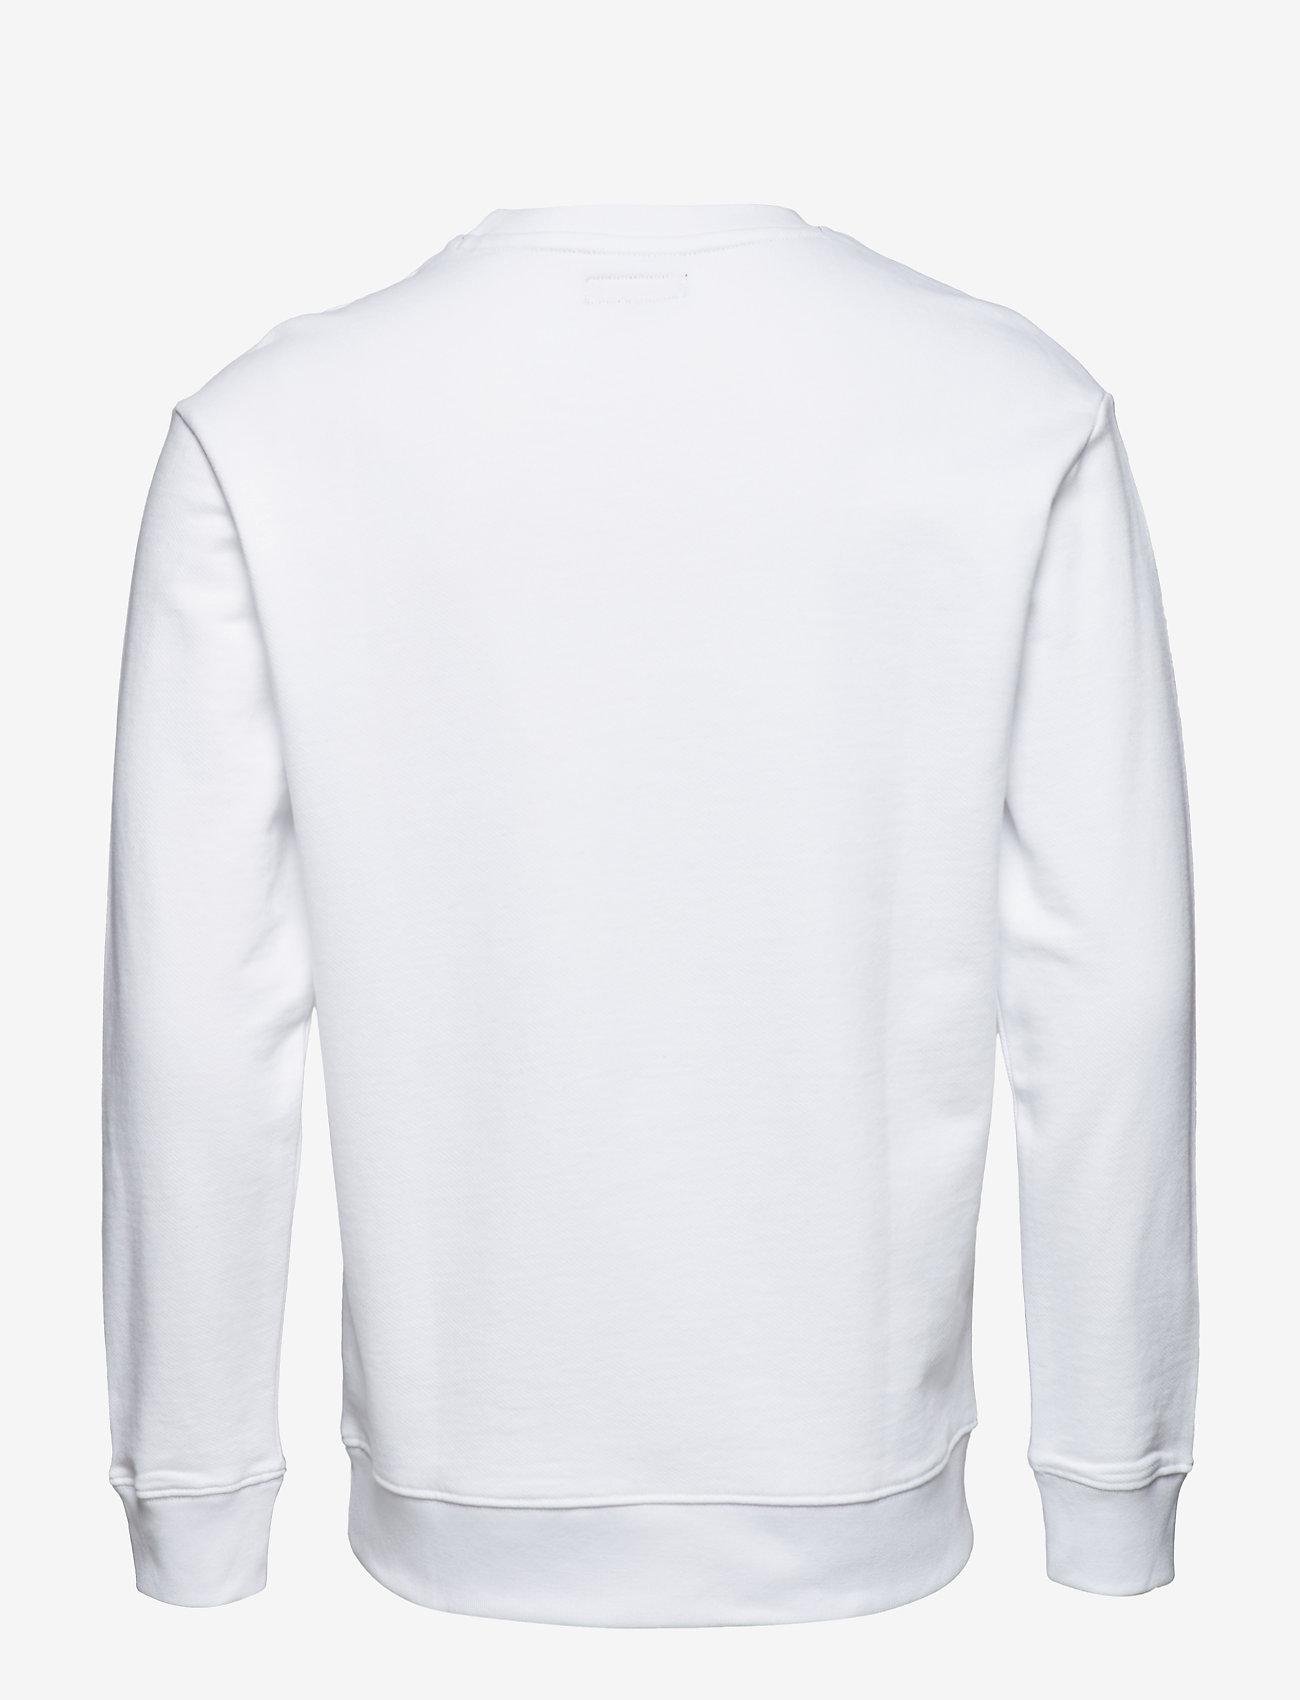 Lee Jeans - LOGO SWS - sweatshirts - white